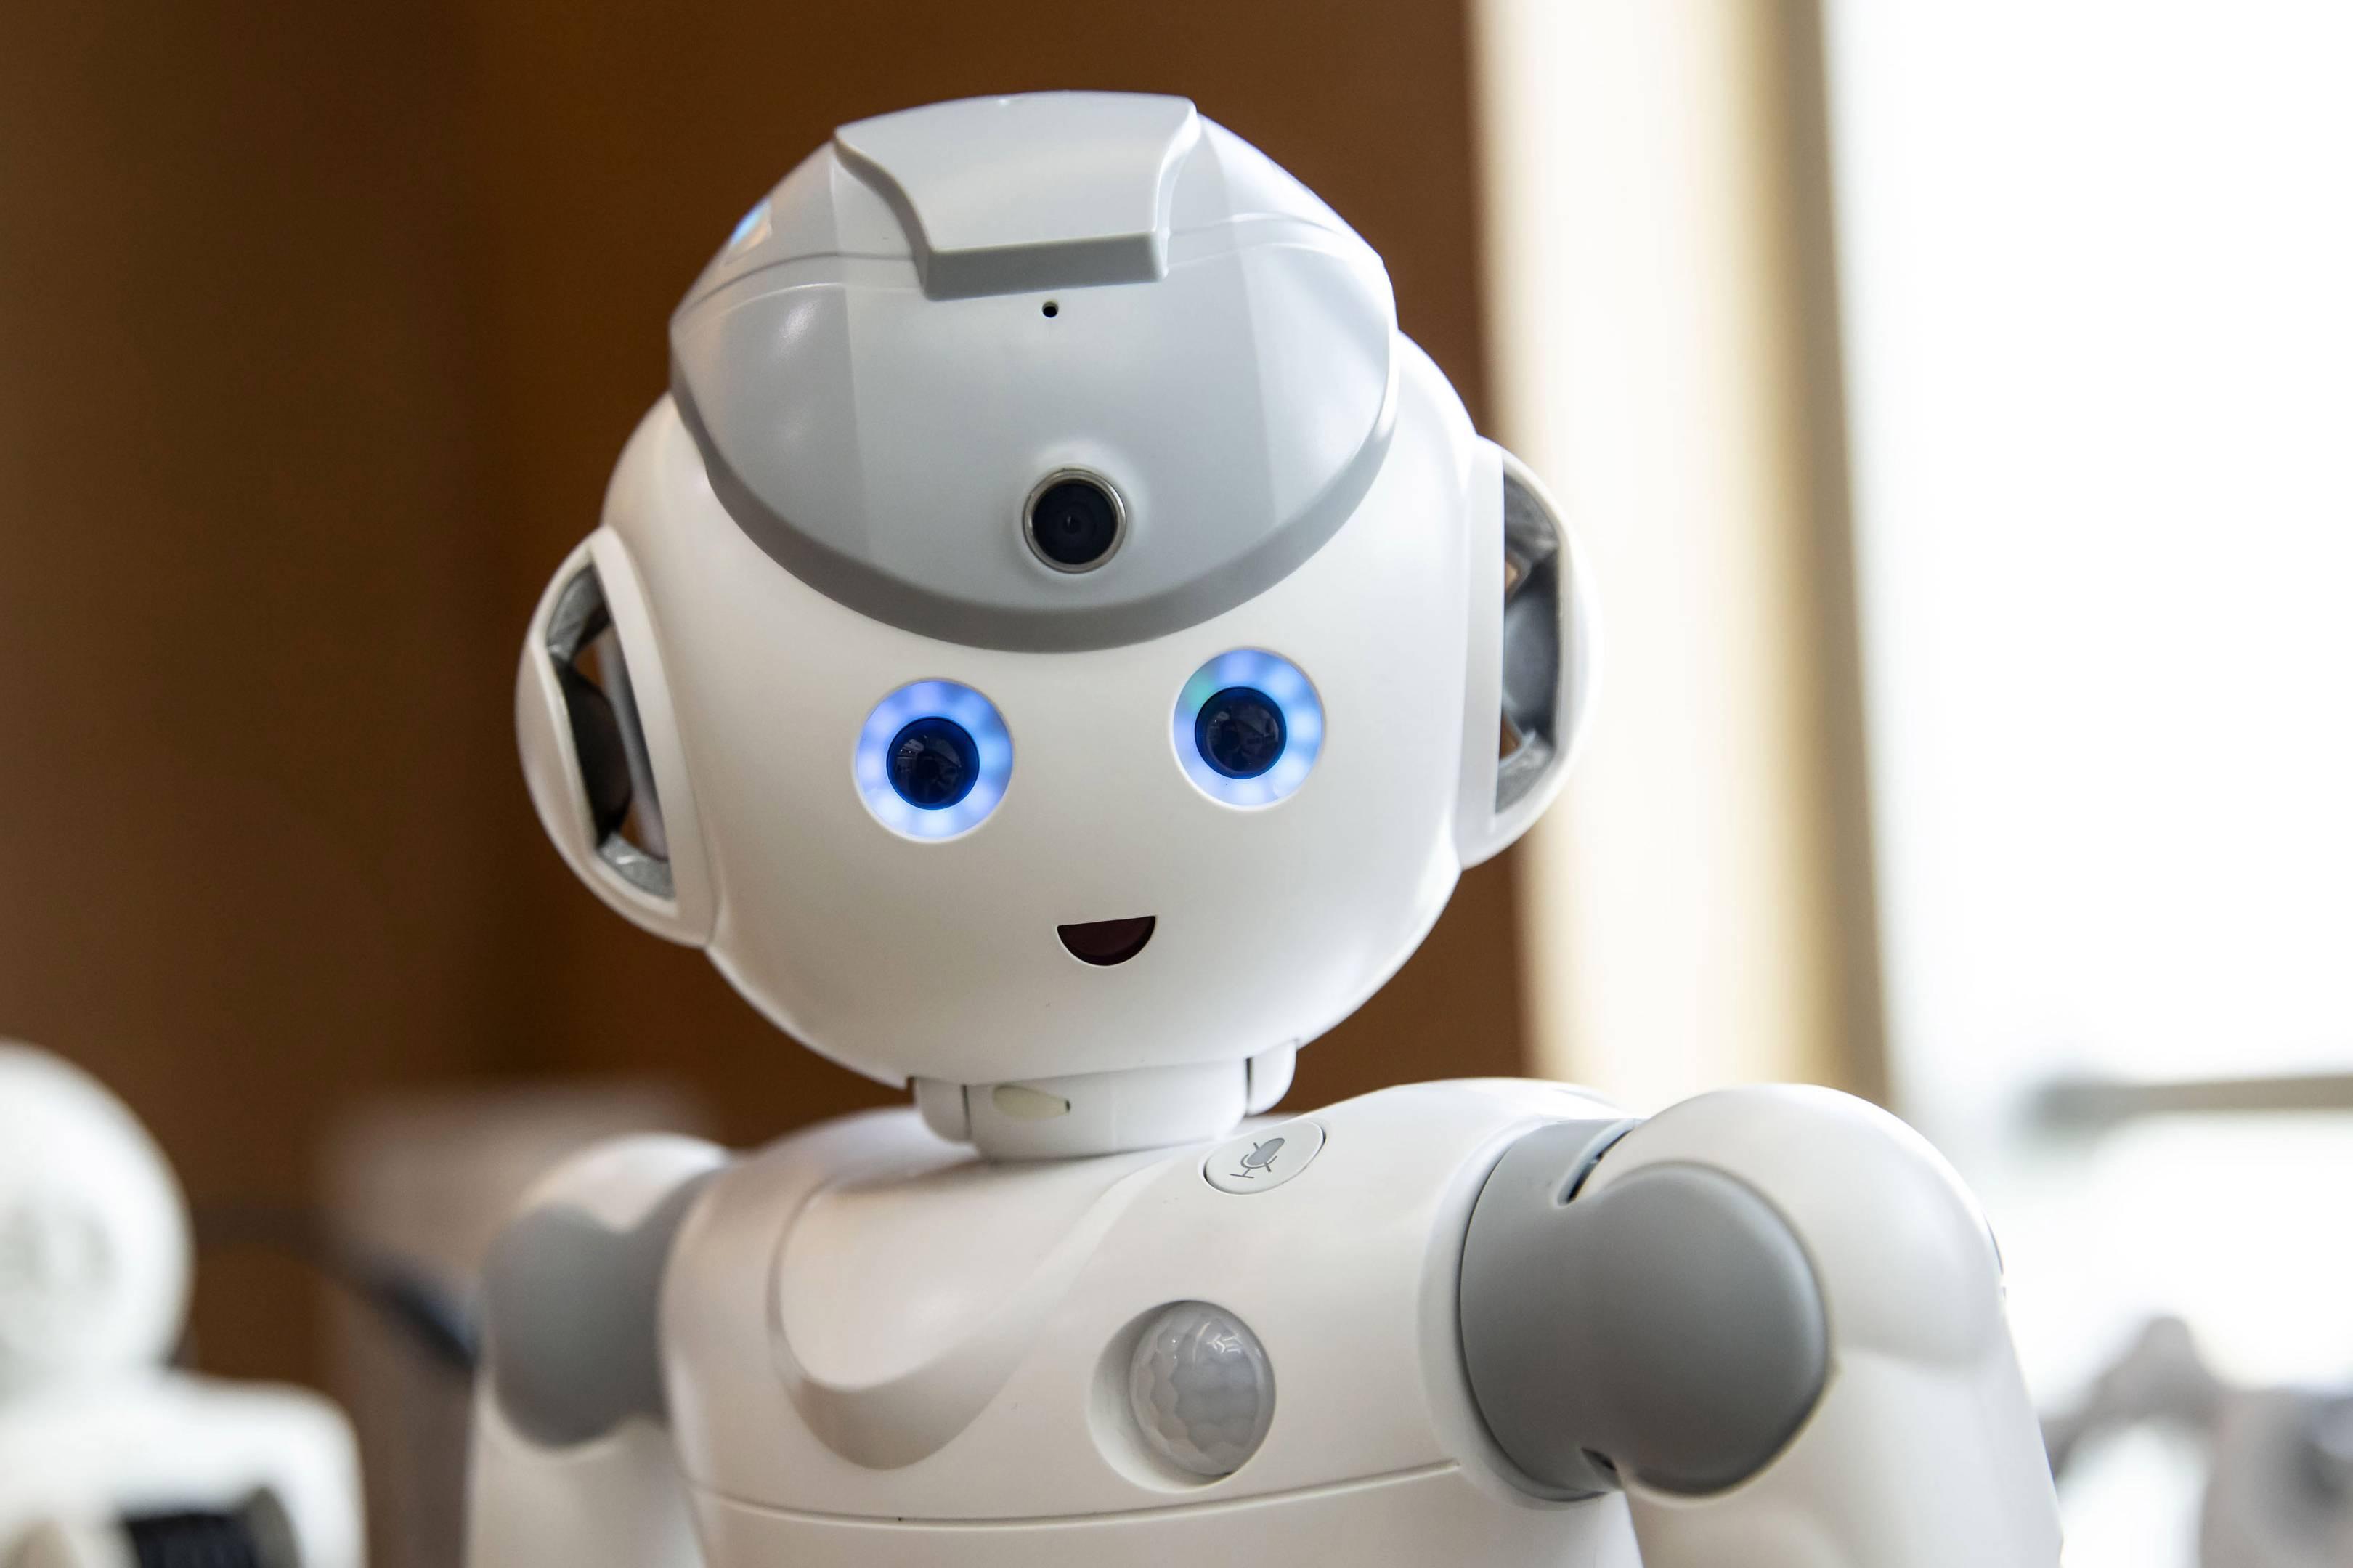 Alexa vs Google Assistant? At CES, the battle moves into robots